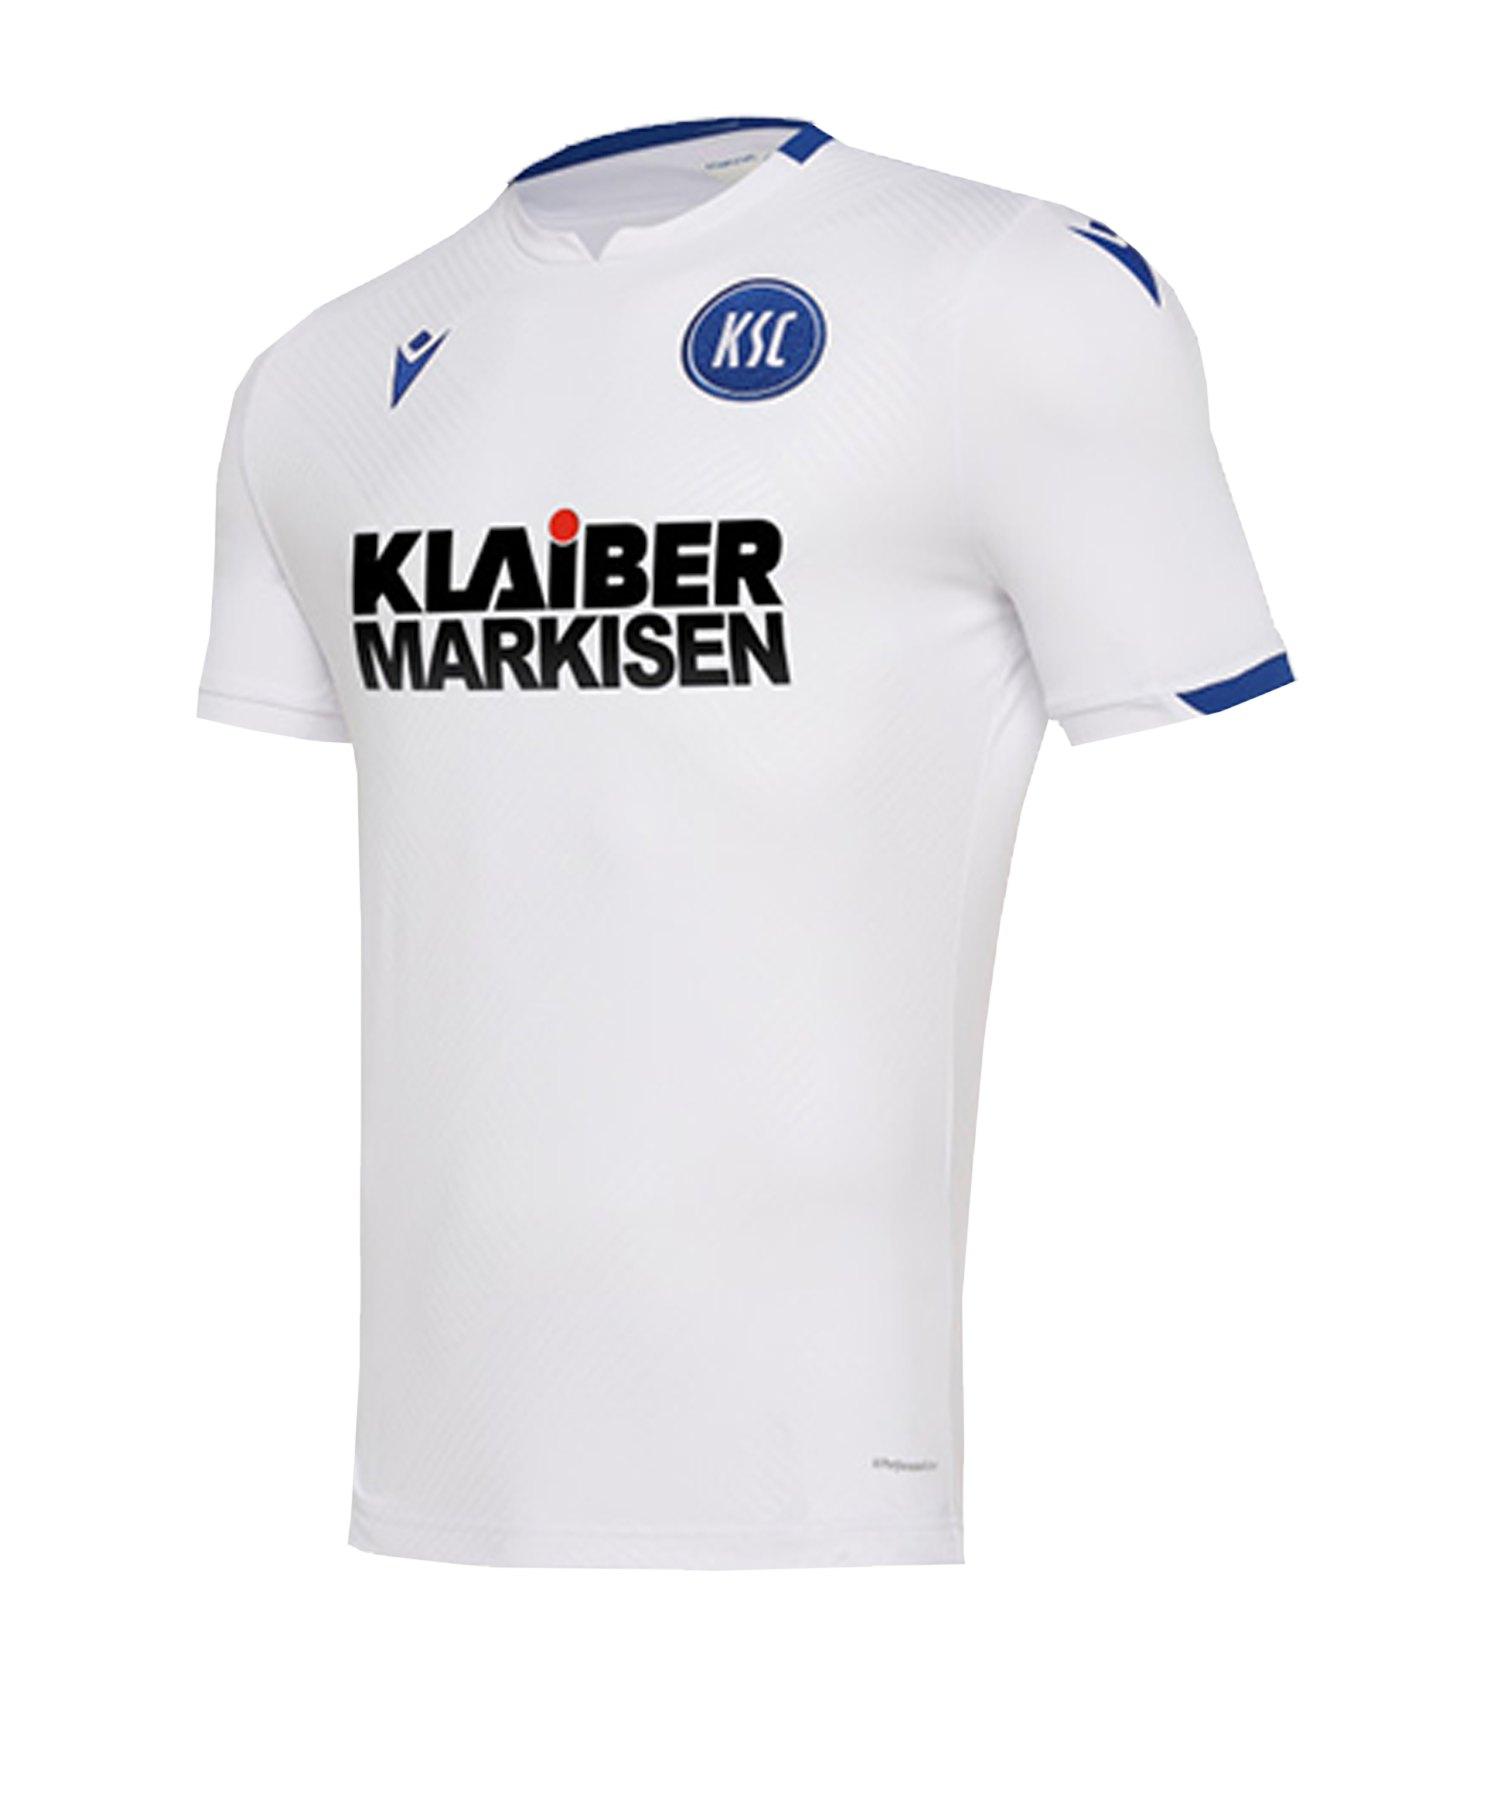 Macron Karlsruher SC Auth Trikot Away 2019/2020 Weiss - weiss